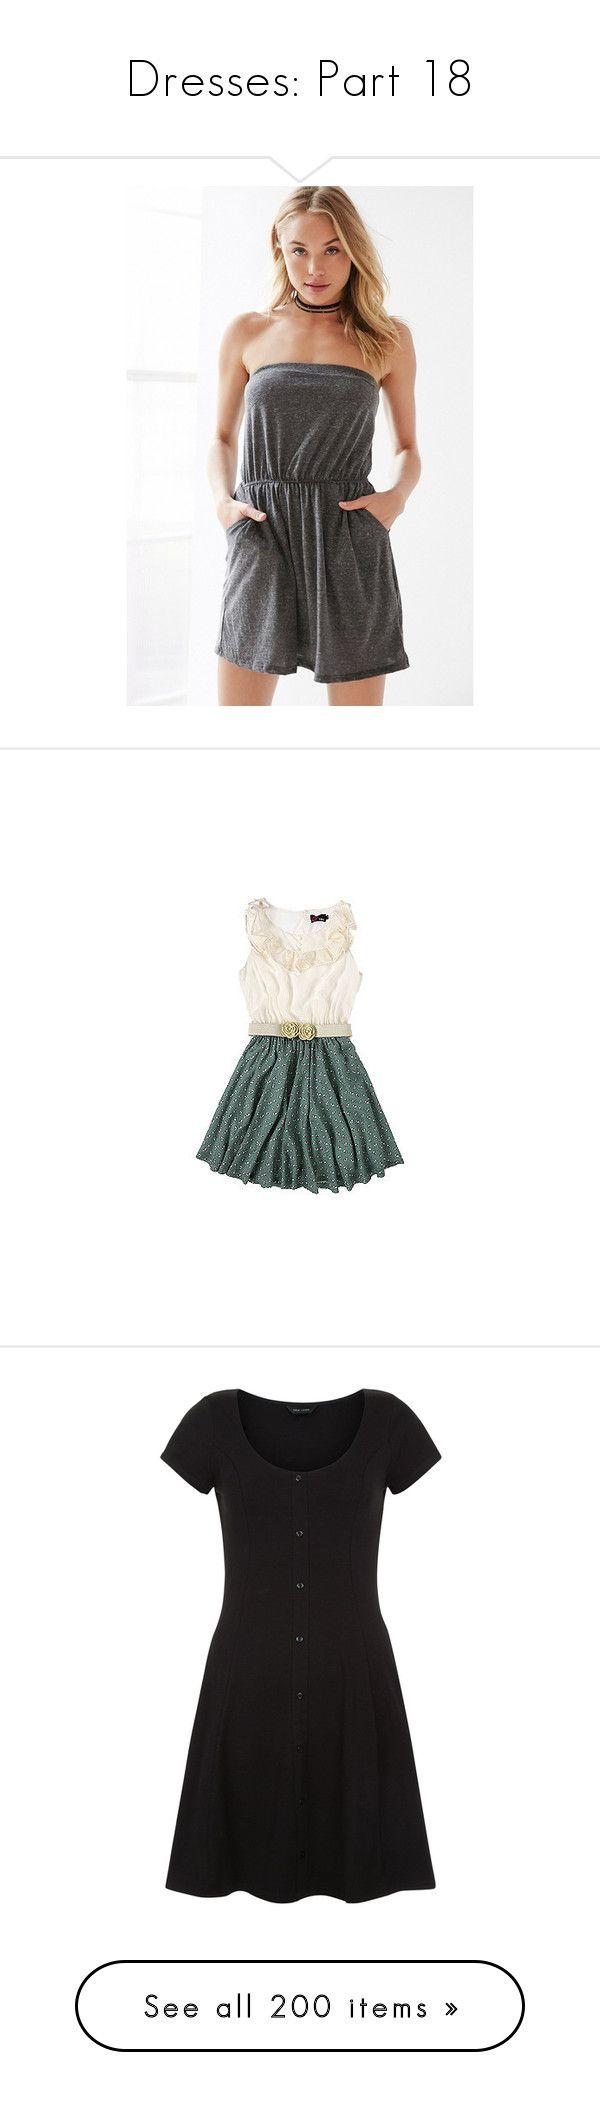 """Dresses: Part 18"" by nerdbucket ❤ liked on Polyvore featuring dresses, short strapless dresses, short tube dress, flare dress, stretch dresses, skater skirt, vestidos, vestiti, short dresses and yumi dresses"